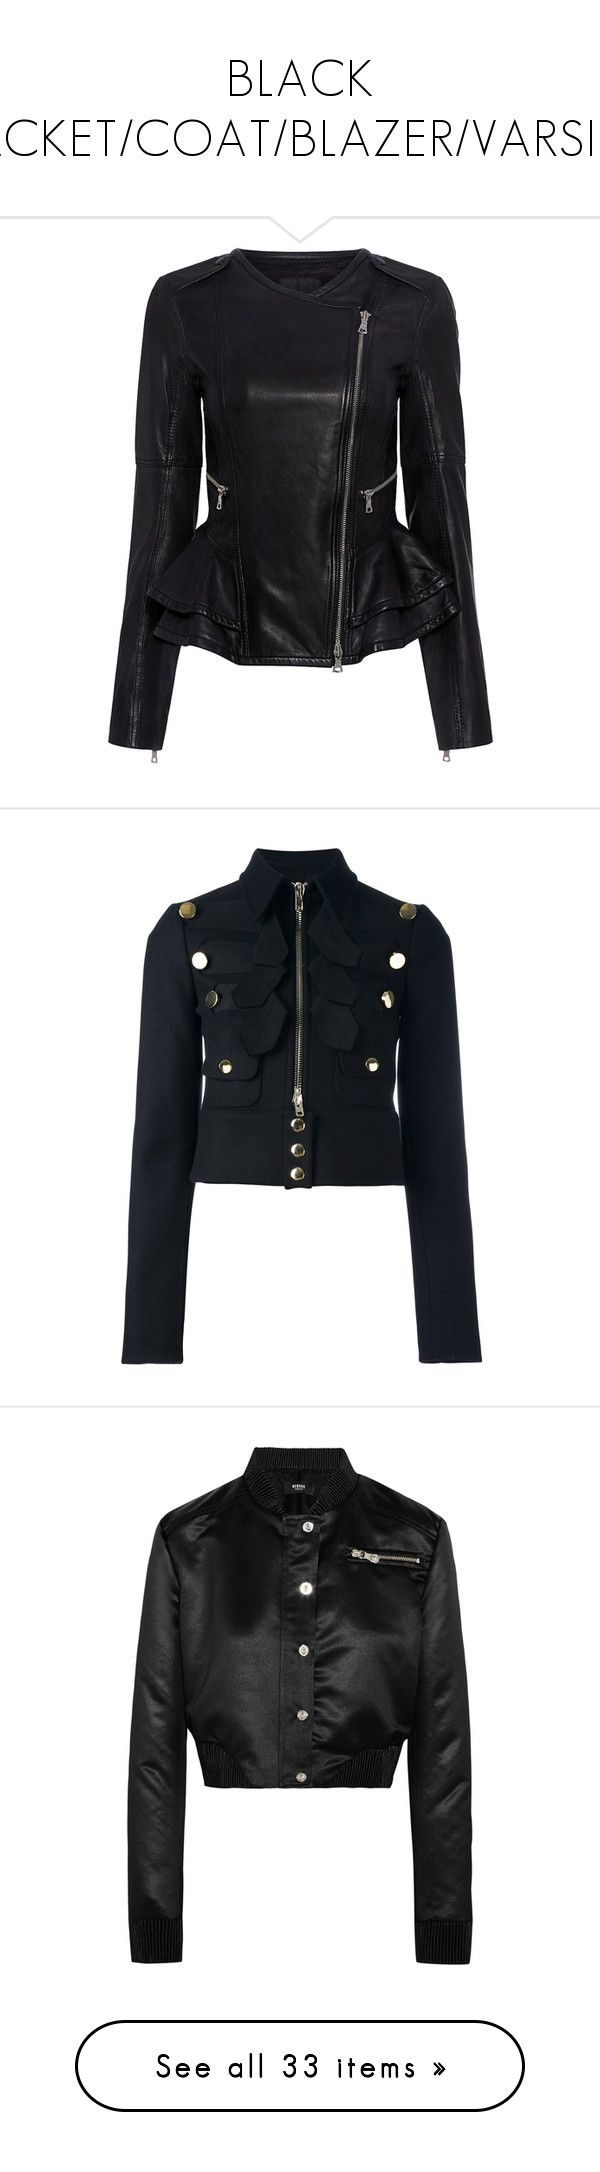 Leather jacket repair toronto -  Black Jacket Coat Blazer Varsity By Aliceridler Liked On Polyvore